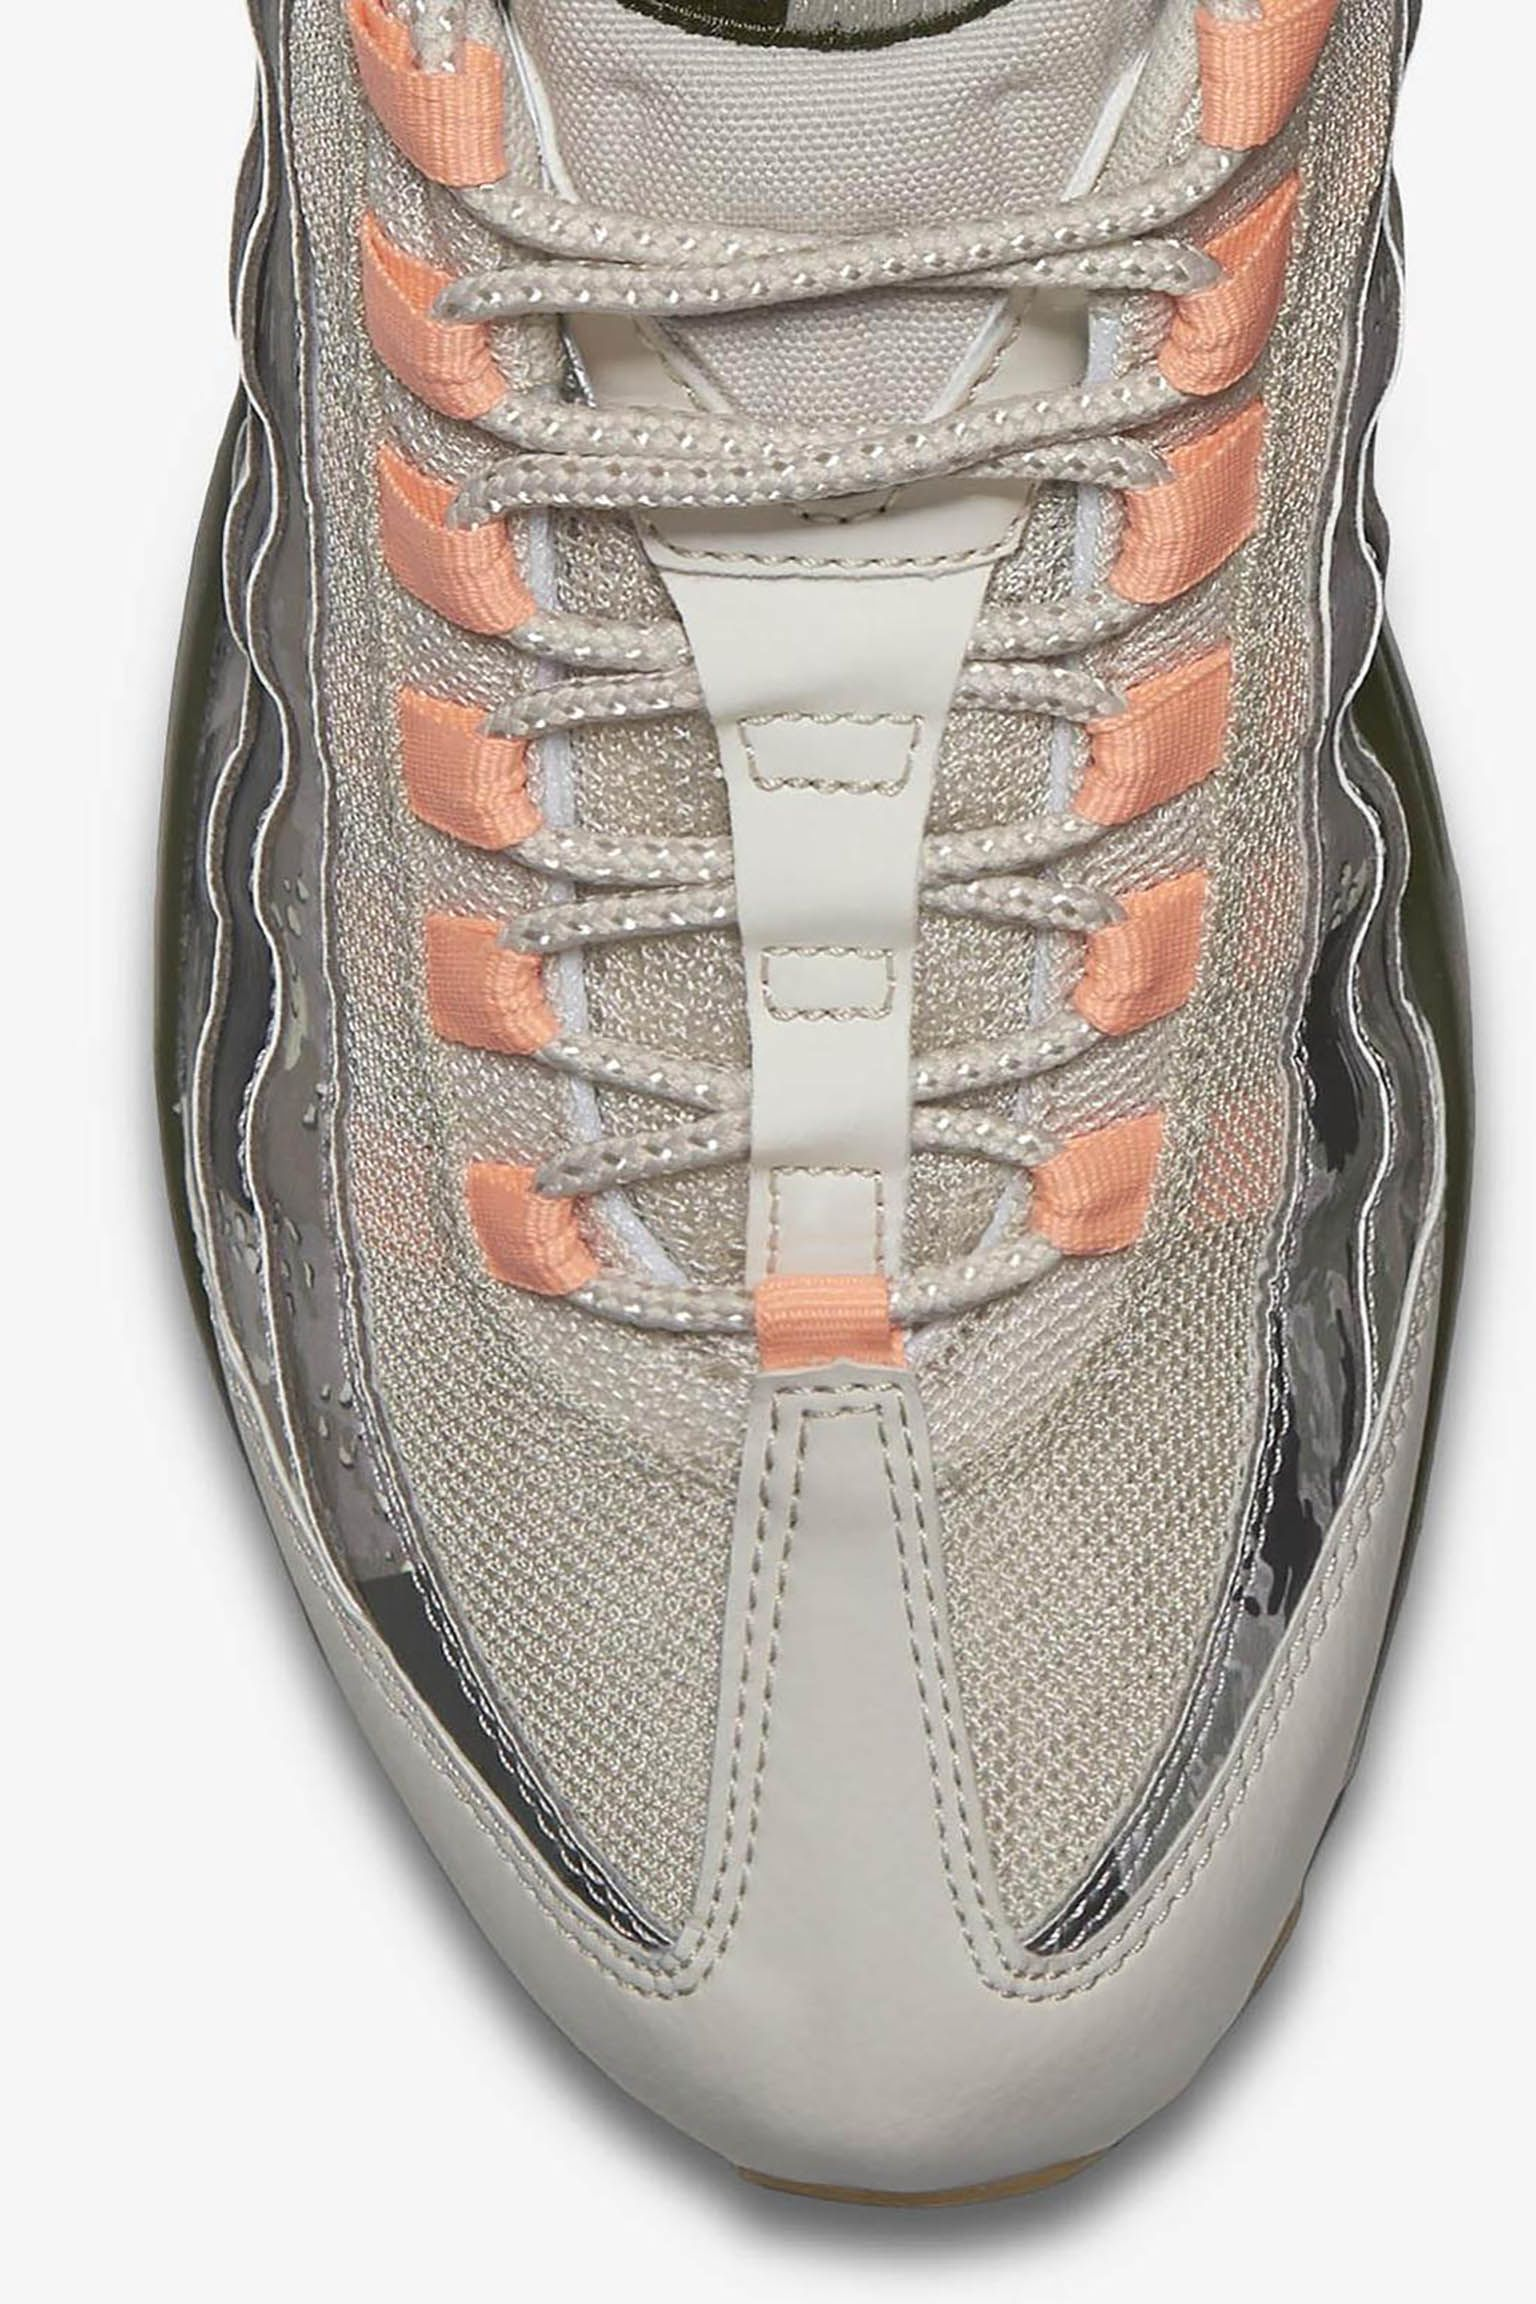 Nike Air Max 95 'Cargo Khaki & Sunset Tint' Release Date. Nike SNKRS